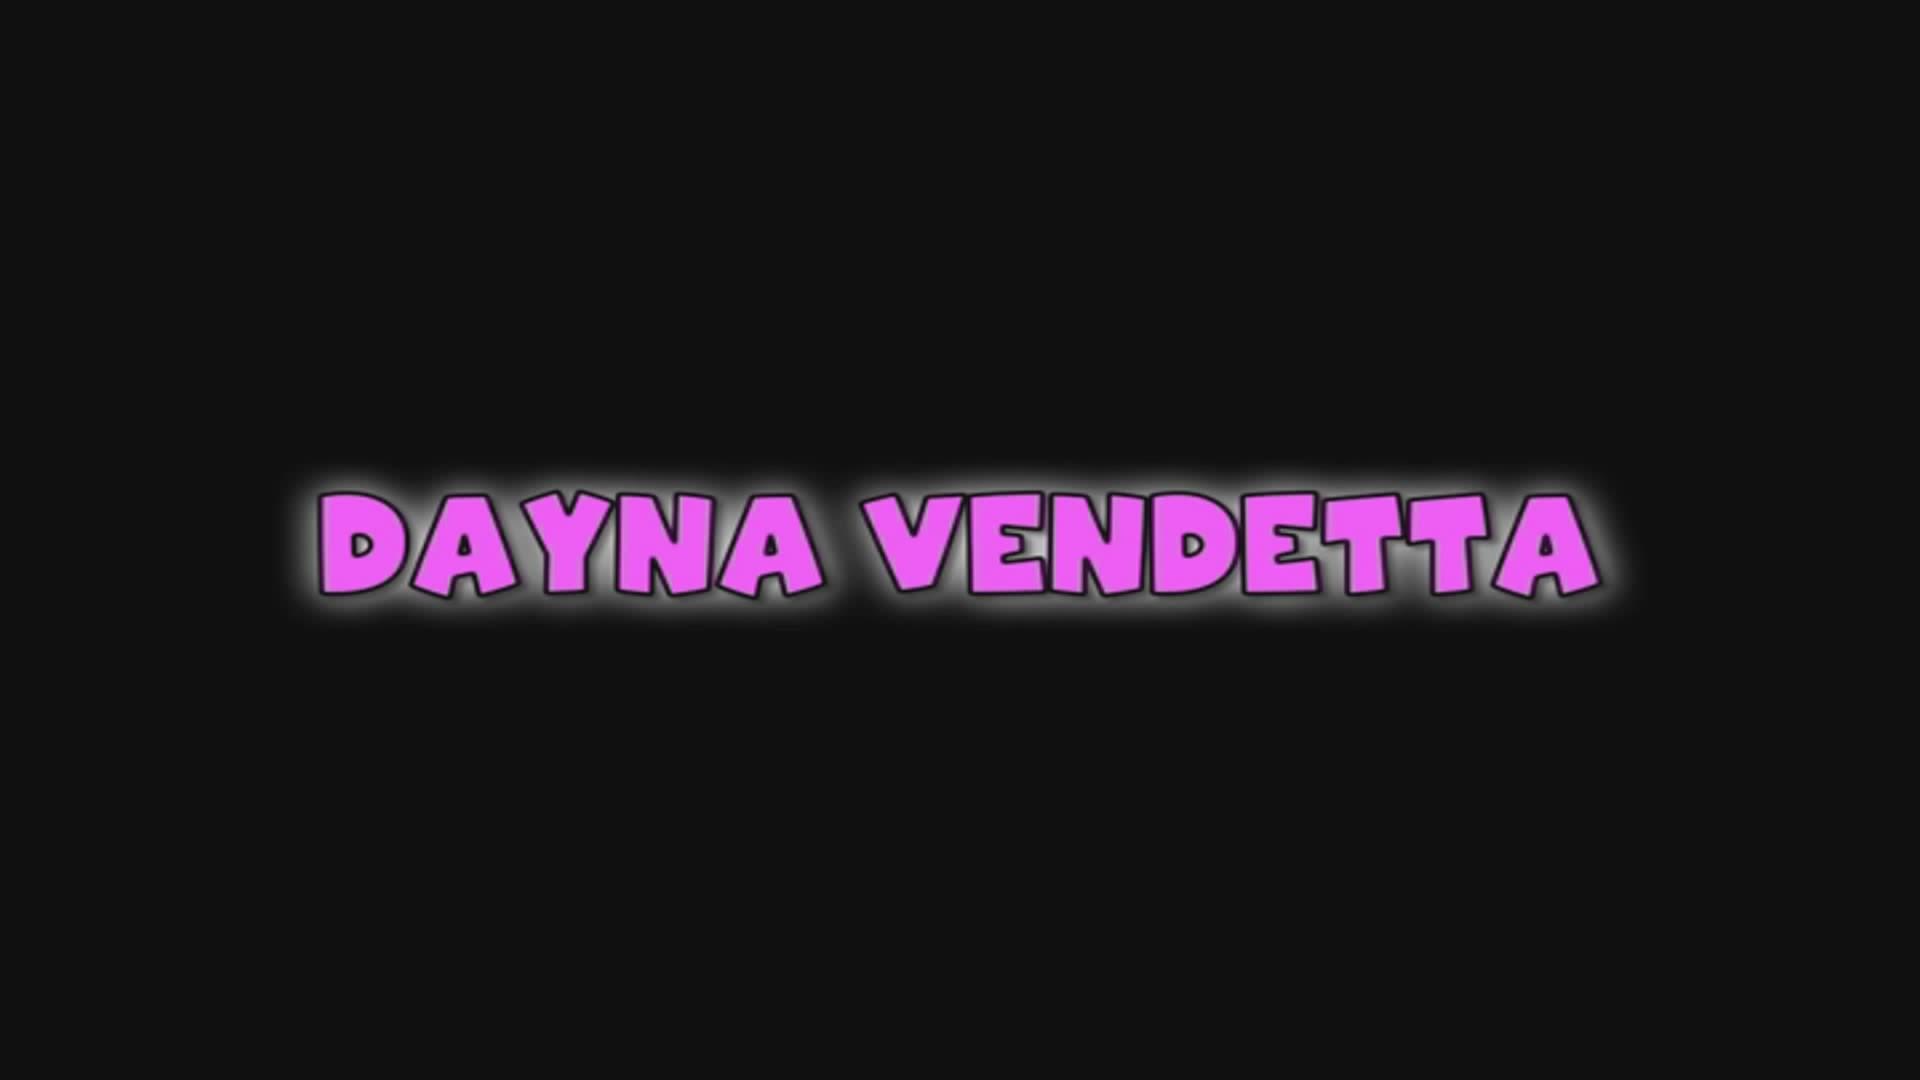 Dayna Vendetta - Галерея 3487315